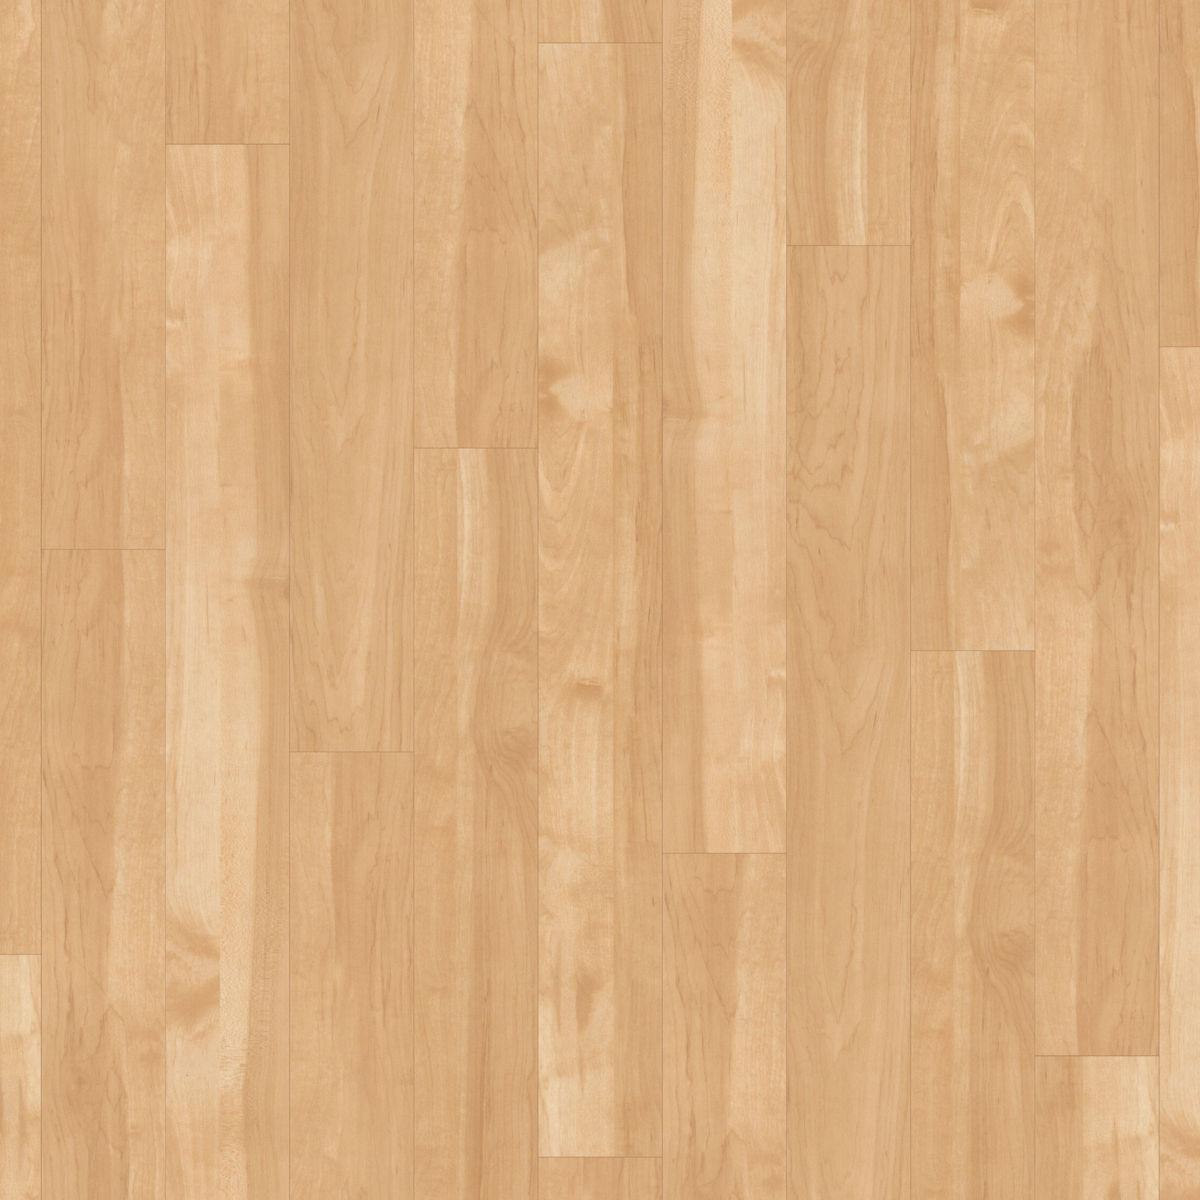 Karndean Knight Tile Sycamore Kp32 Vinyl Flooring